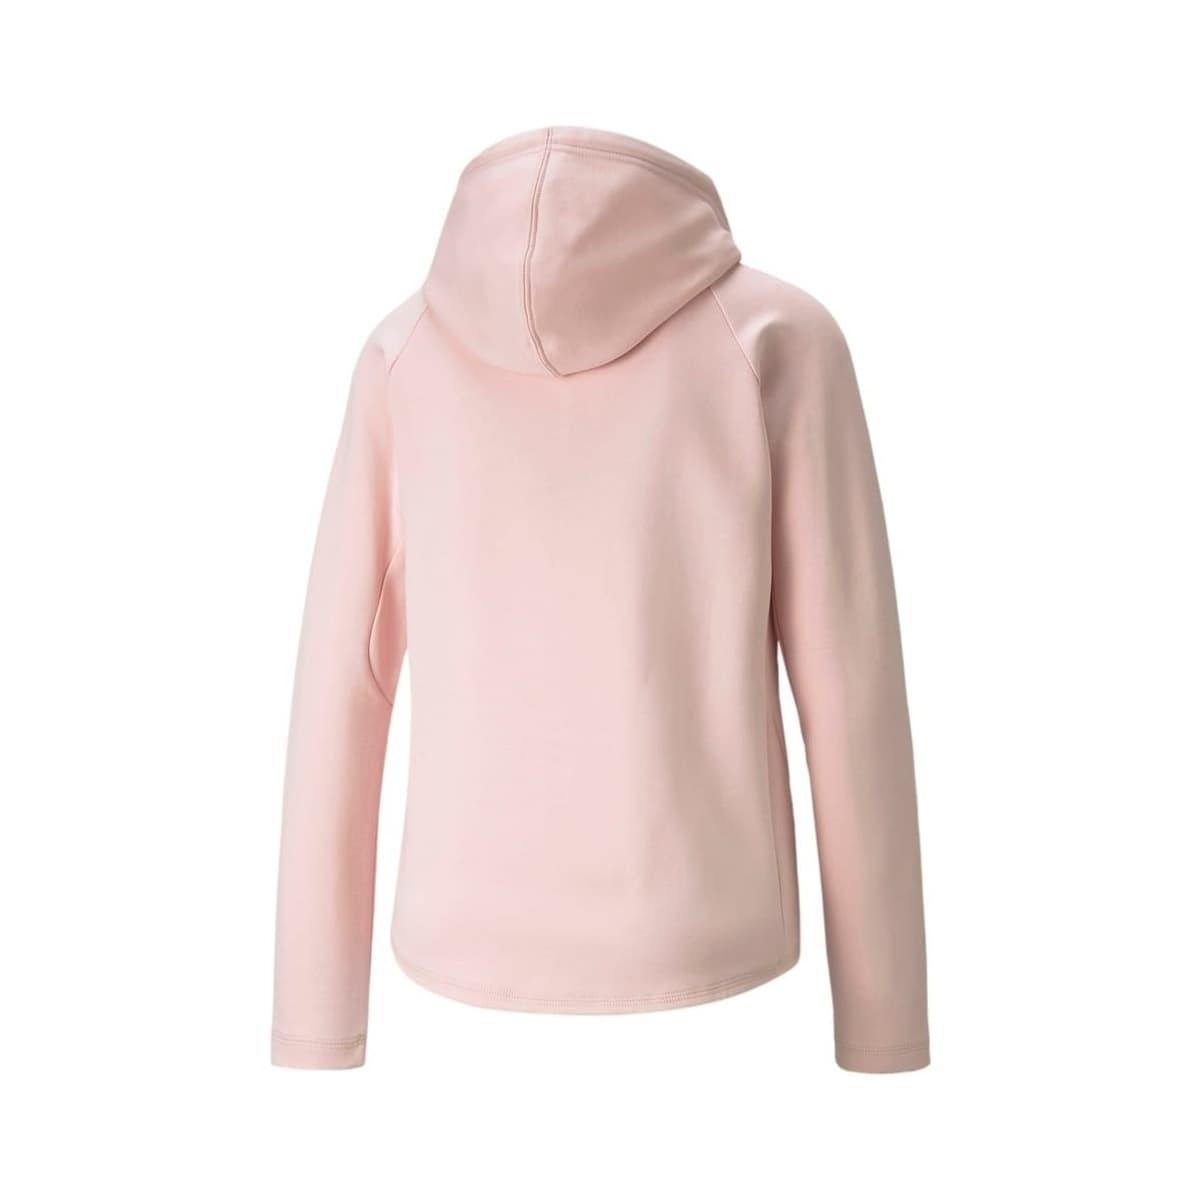 Evostripe Full-Zip Kadın Pembe Sweatshirt (589157-36)